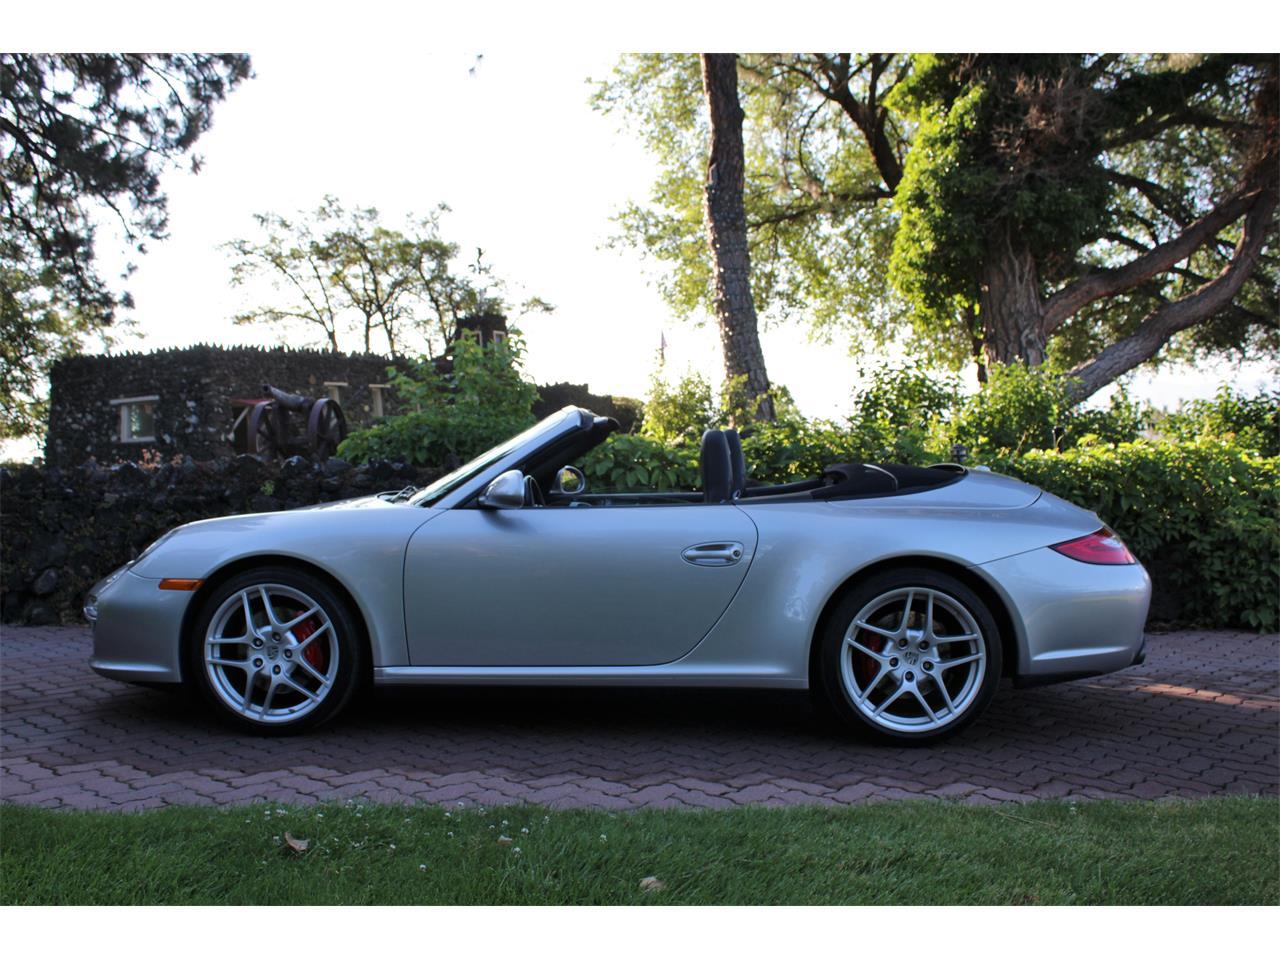 2010 Porsche 550 (CC-1378834) for sale in SPOKANE, Washington